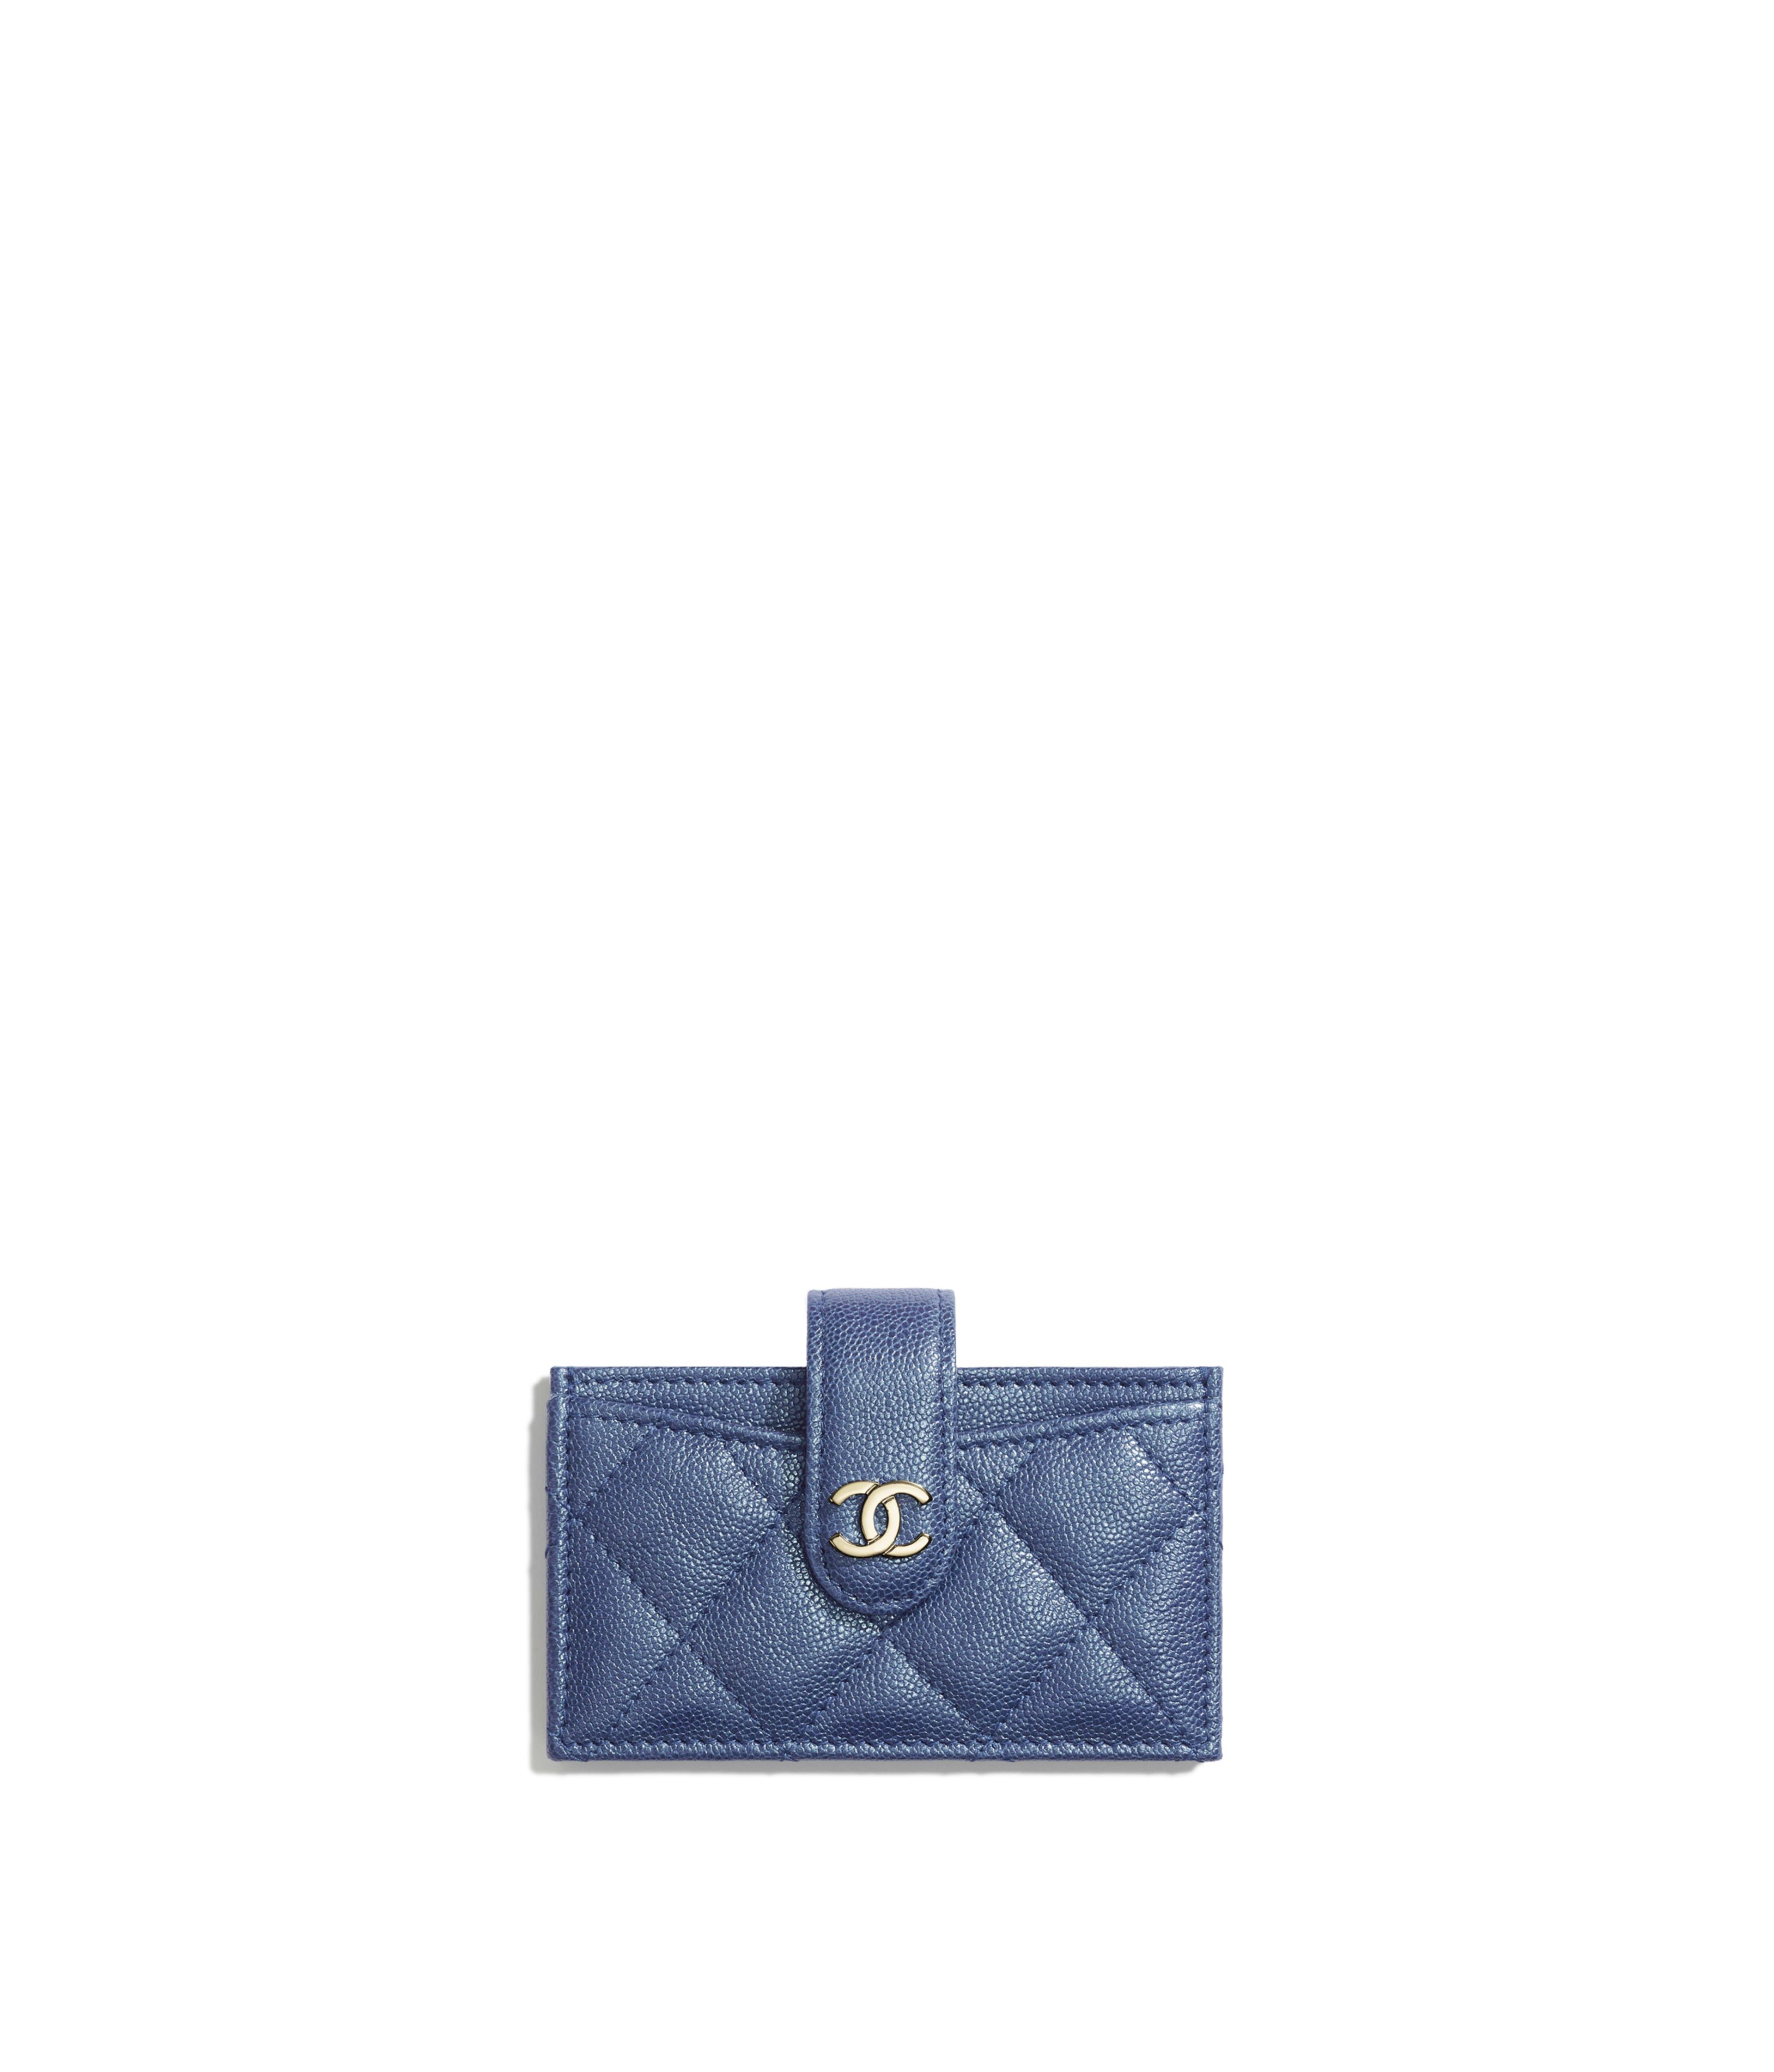 e40a88b76995 Card Holder Iridescent Grained Calfskin & Gold-Tone Metal, Dark Blue Ref.  AP0342B00357N0901